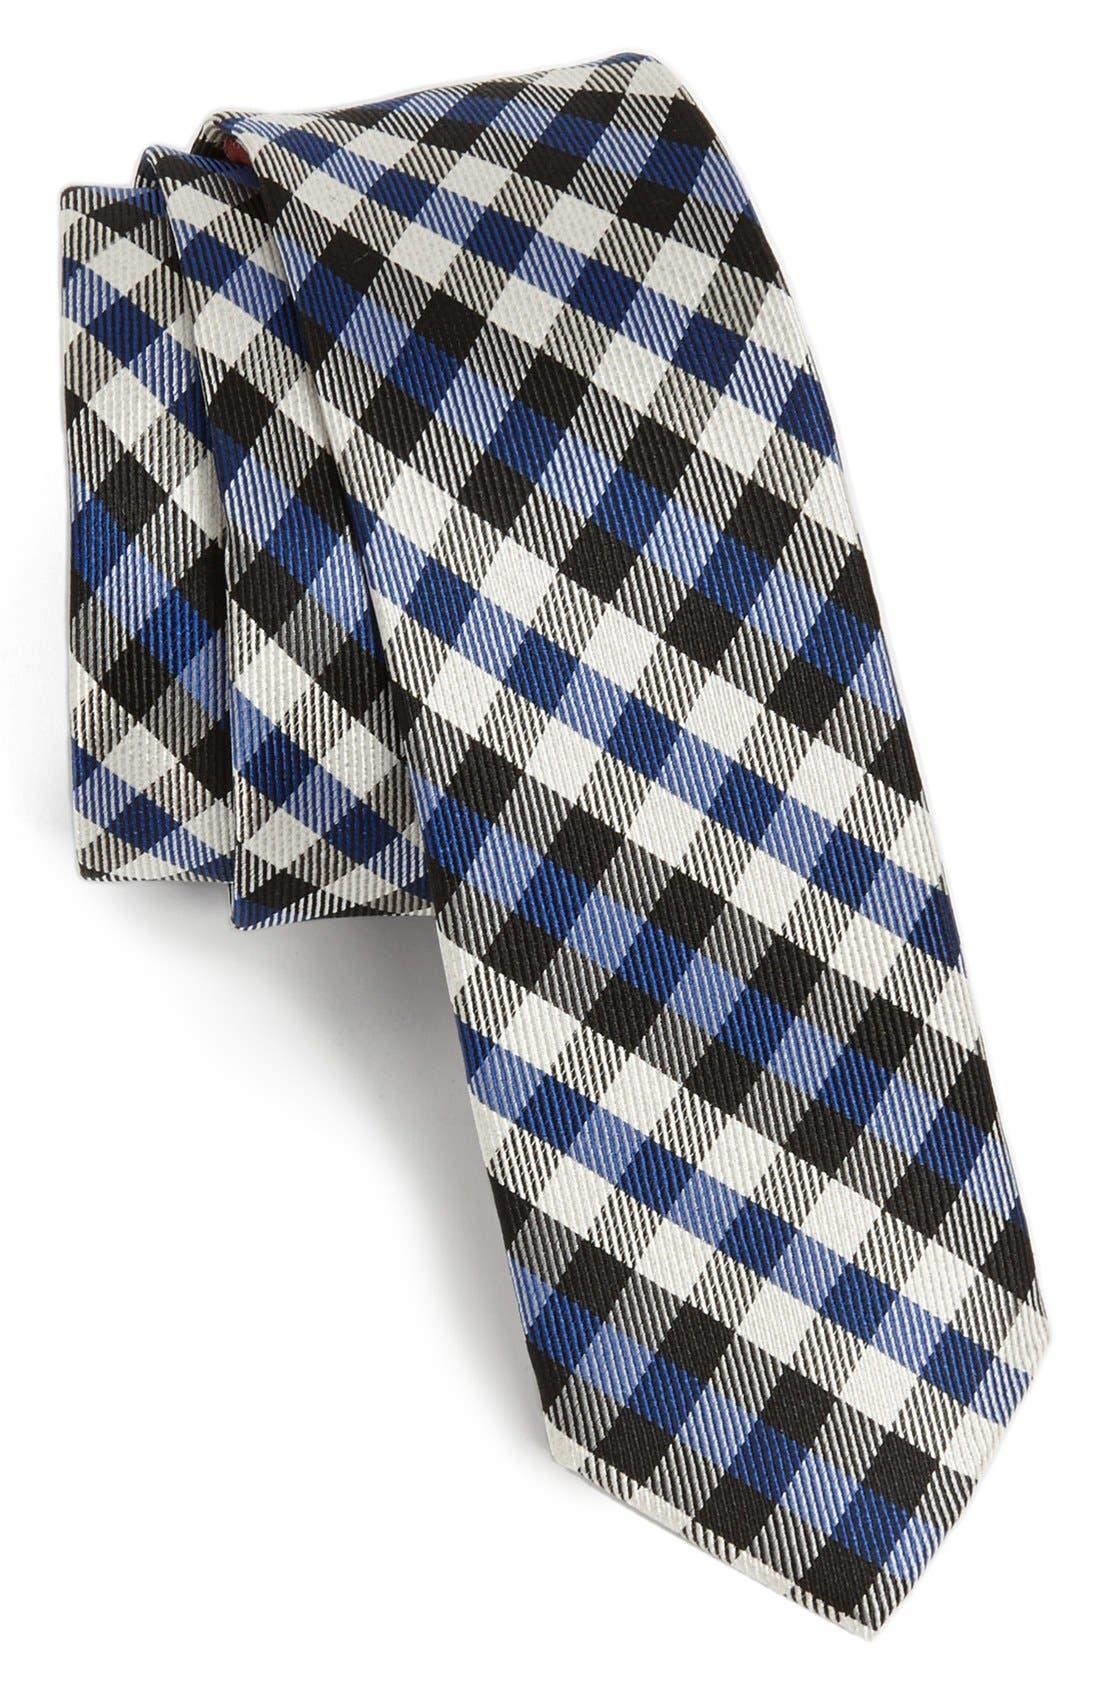 Alternate Image 1 Selected - Original Penguin 'Cape Check' Woven Silk Tie